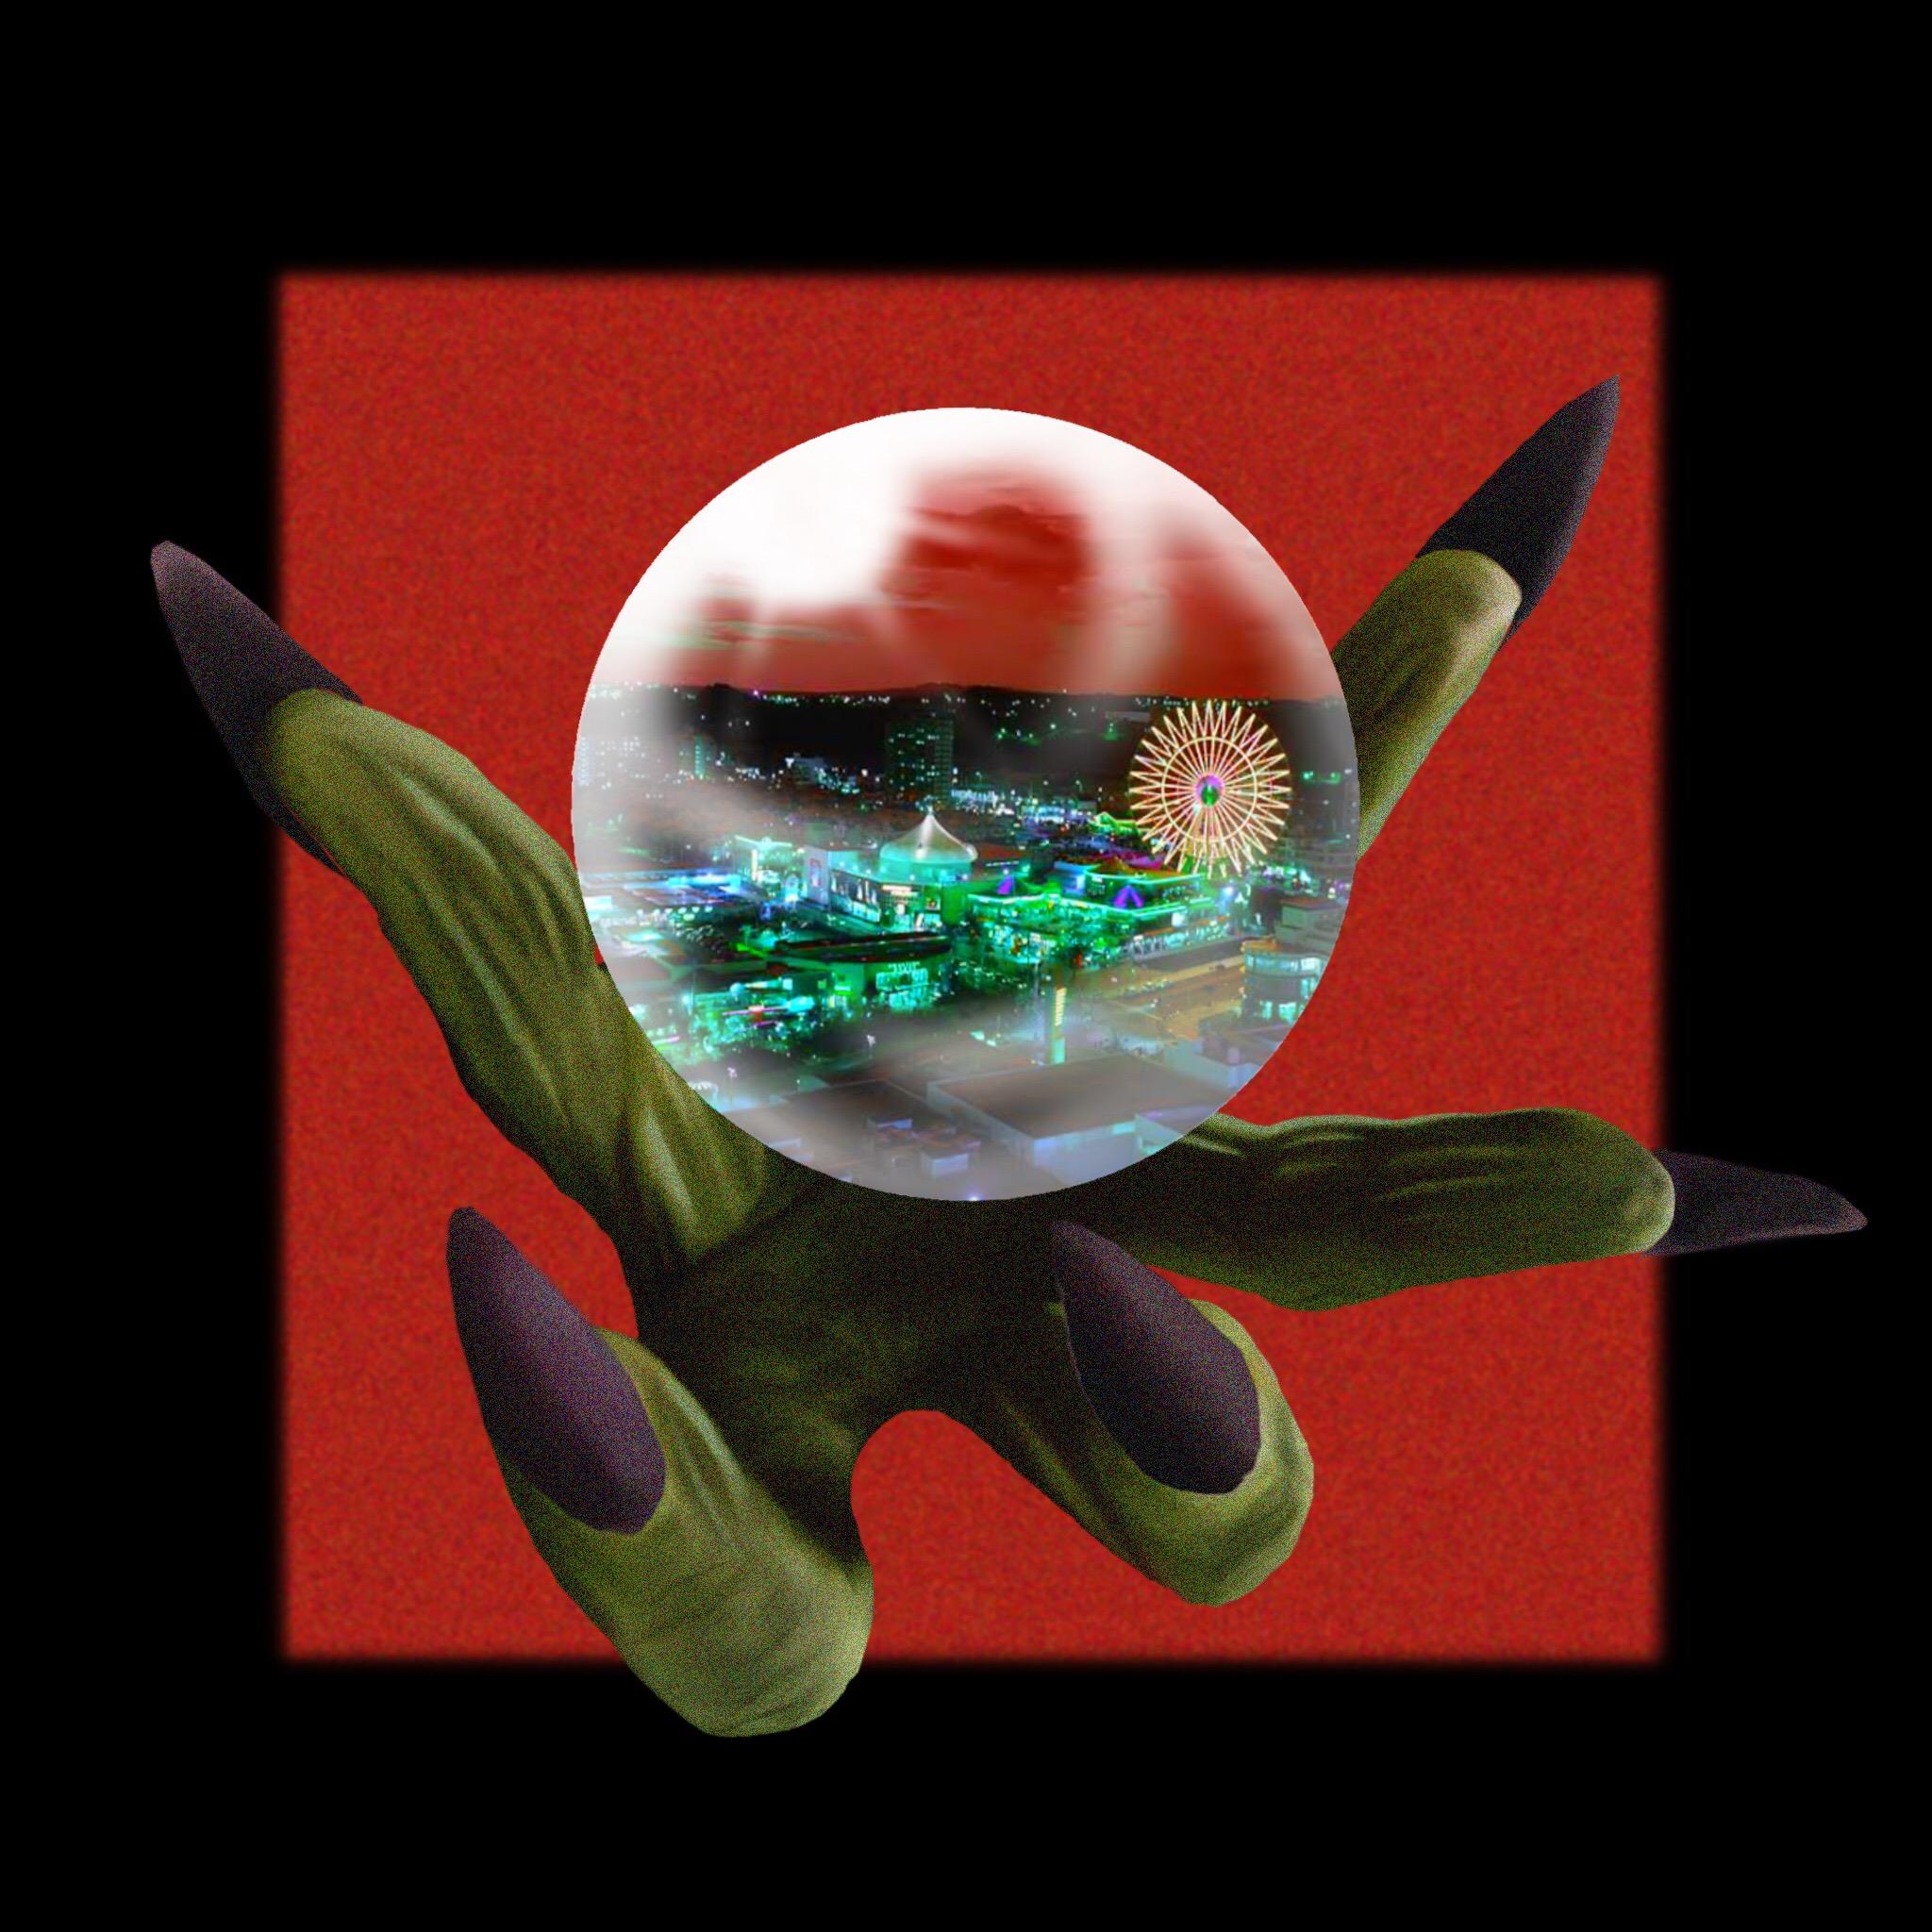 JOE IRON - Devil City ft OZworld aka R'kuma, Lazy Wii & 1otu5 (cover art)